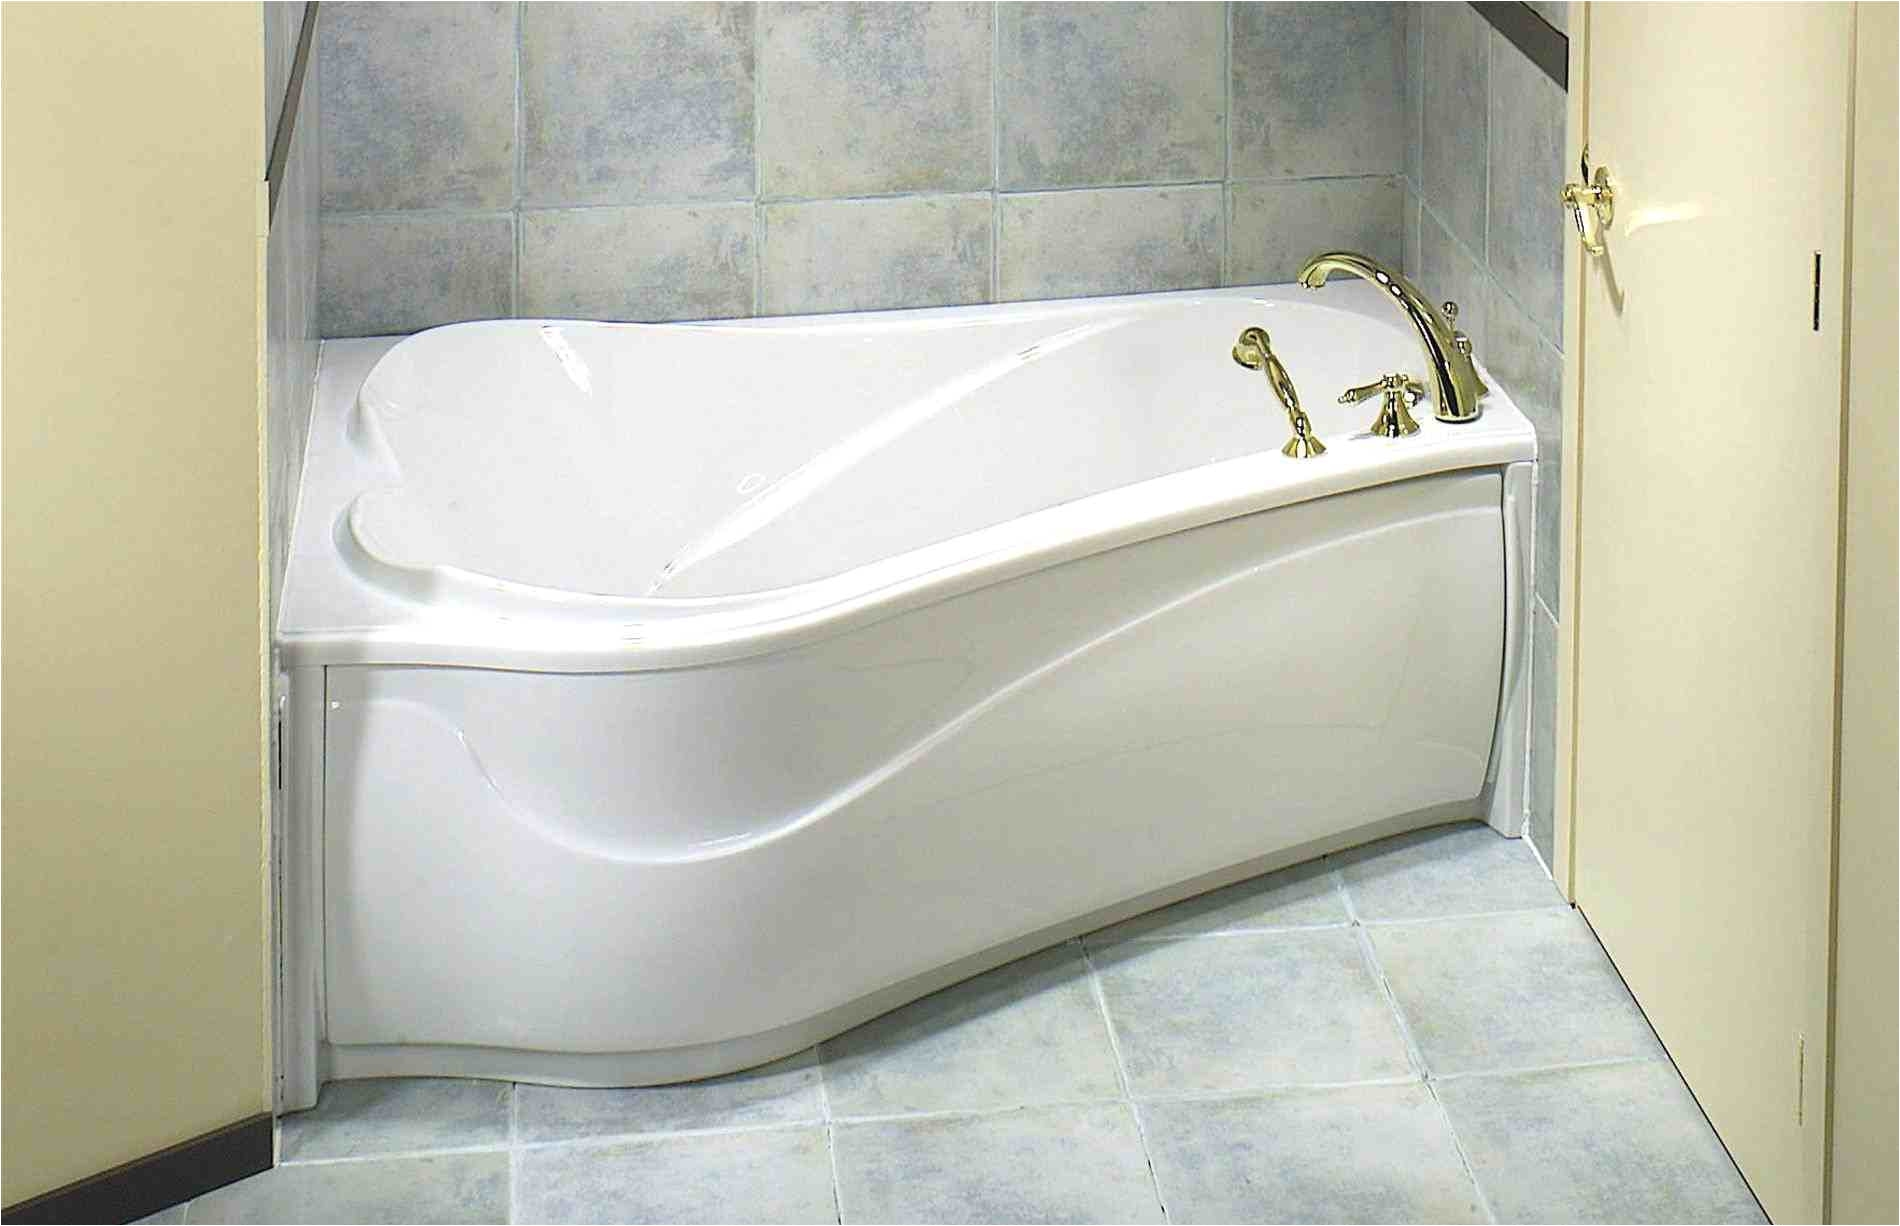 54 x 27 bathtub home depot